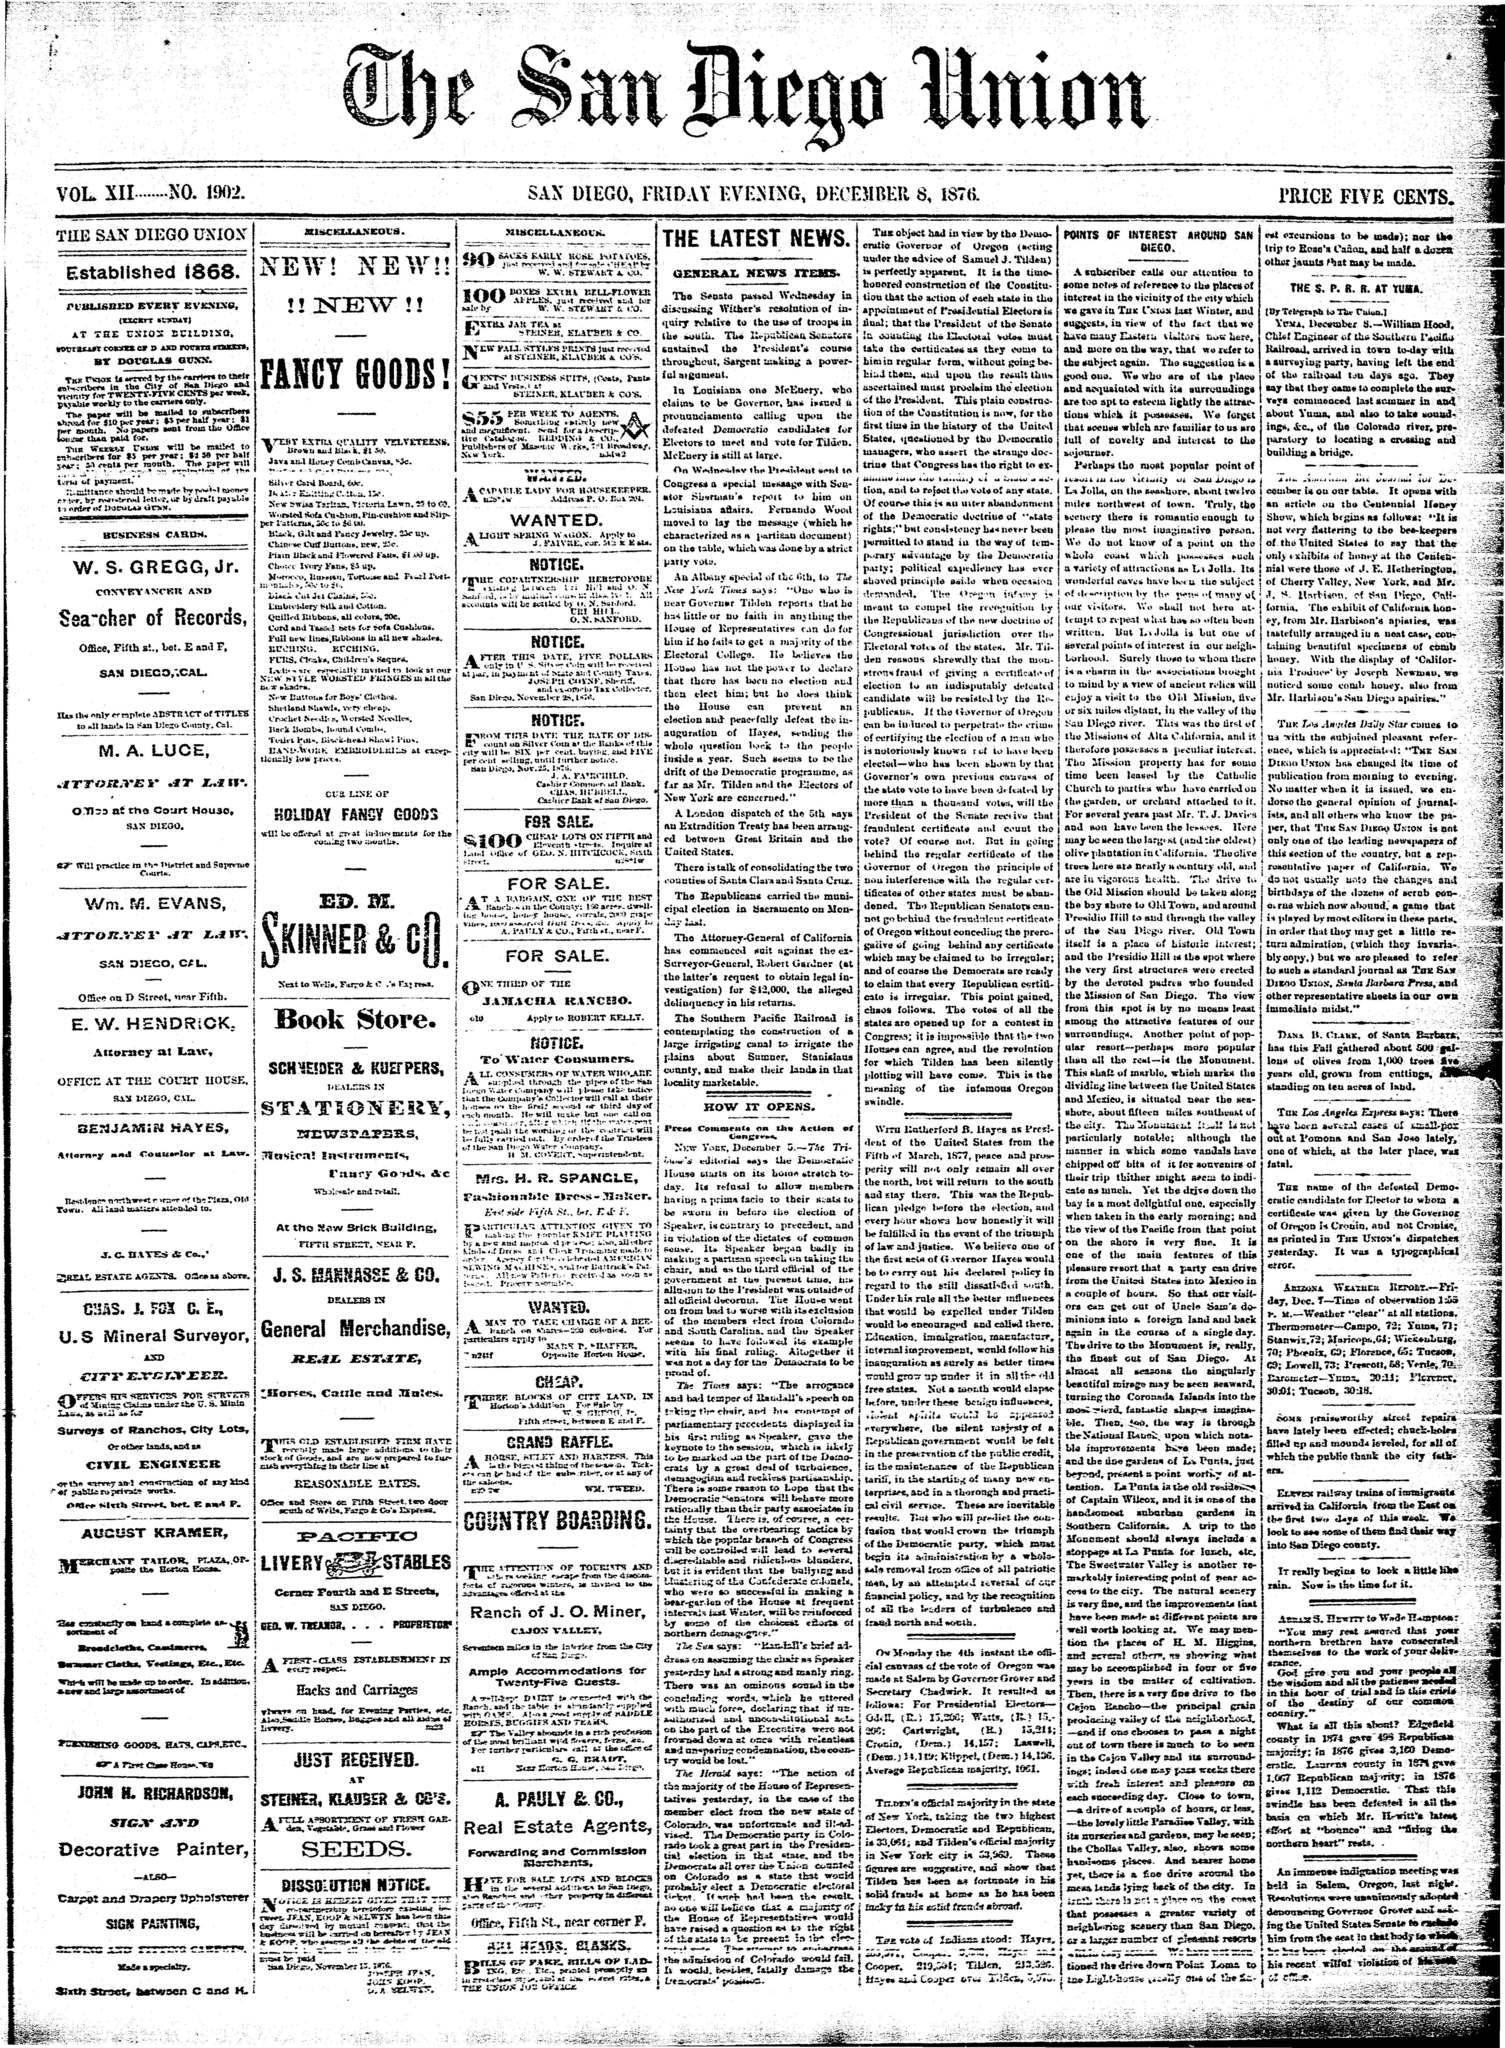 December 8, 1876